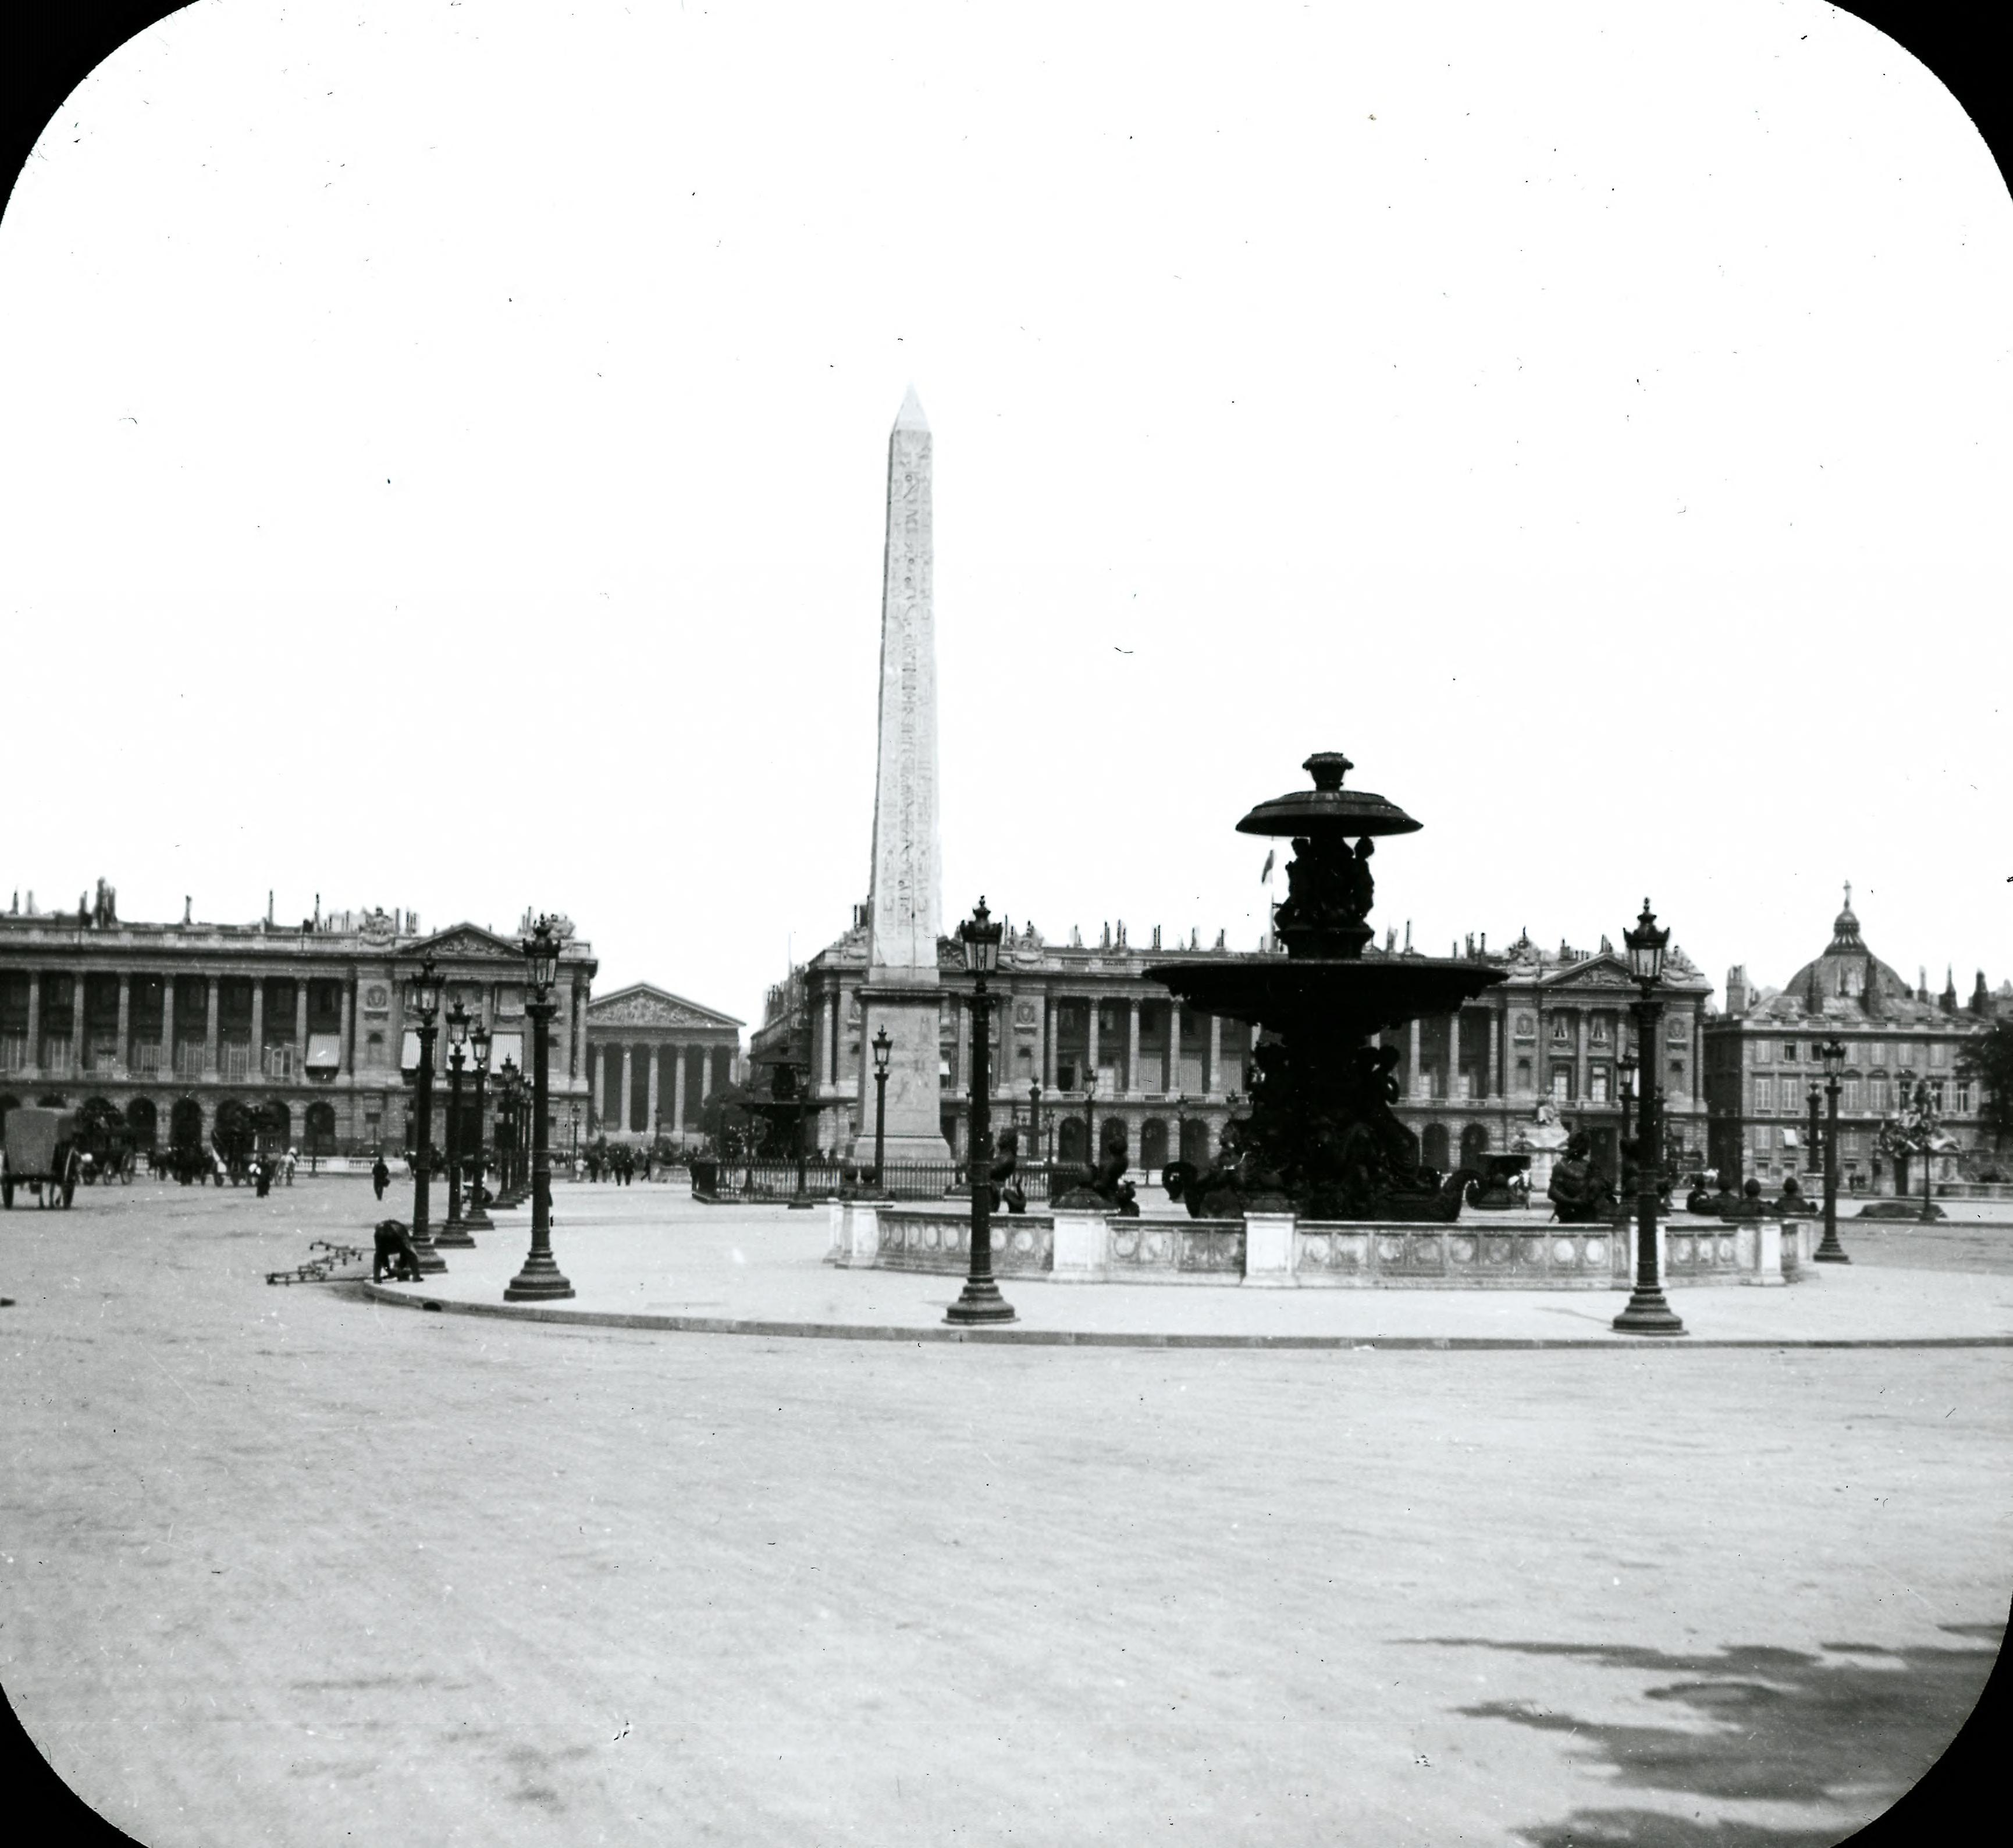 Площадь Согласия. Вид обелиска из Луксора